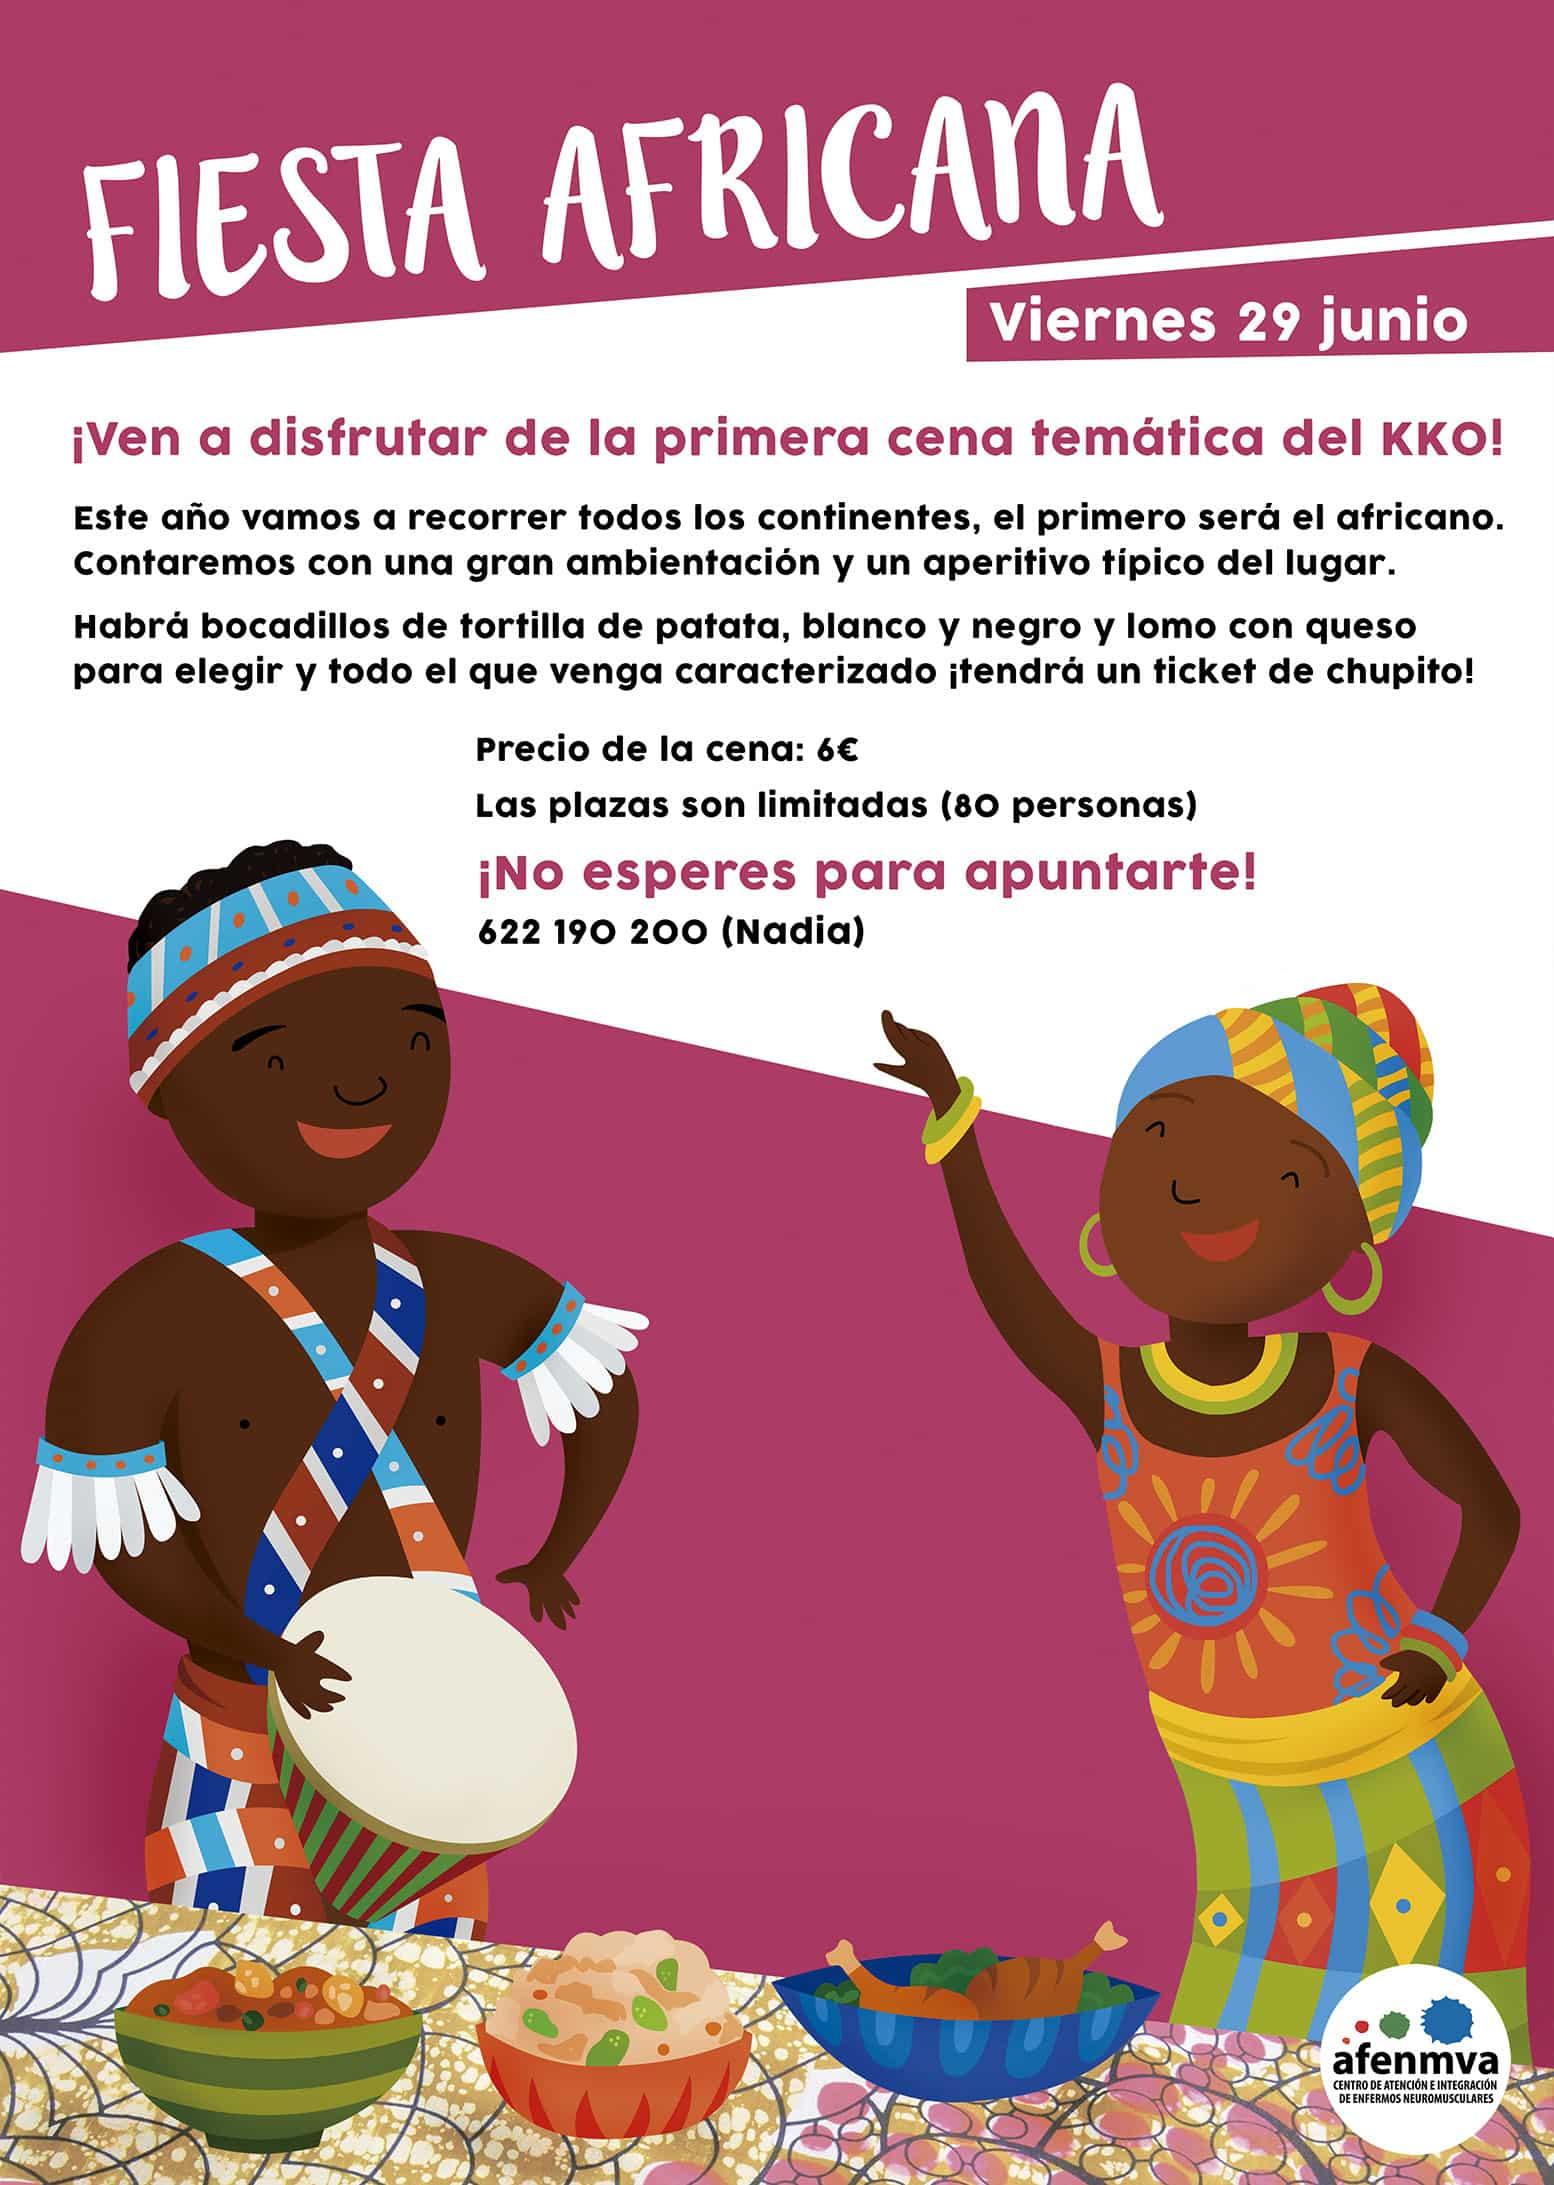 1-Fiesta africana-cartel redes